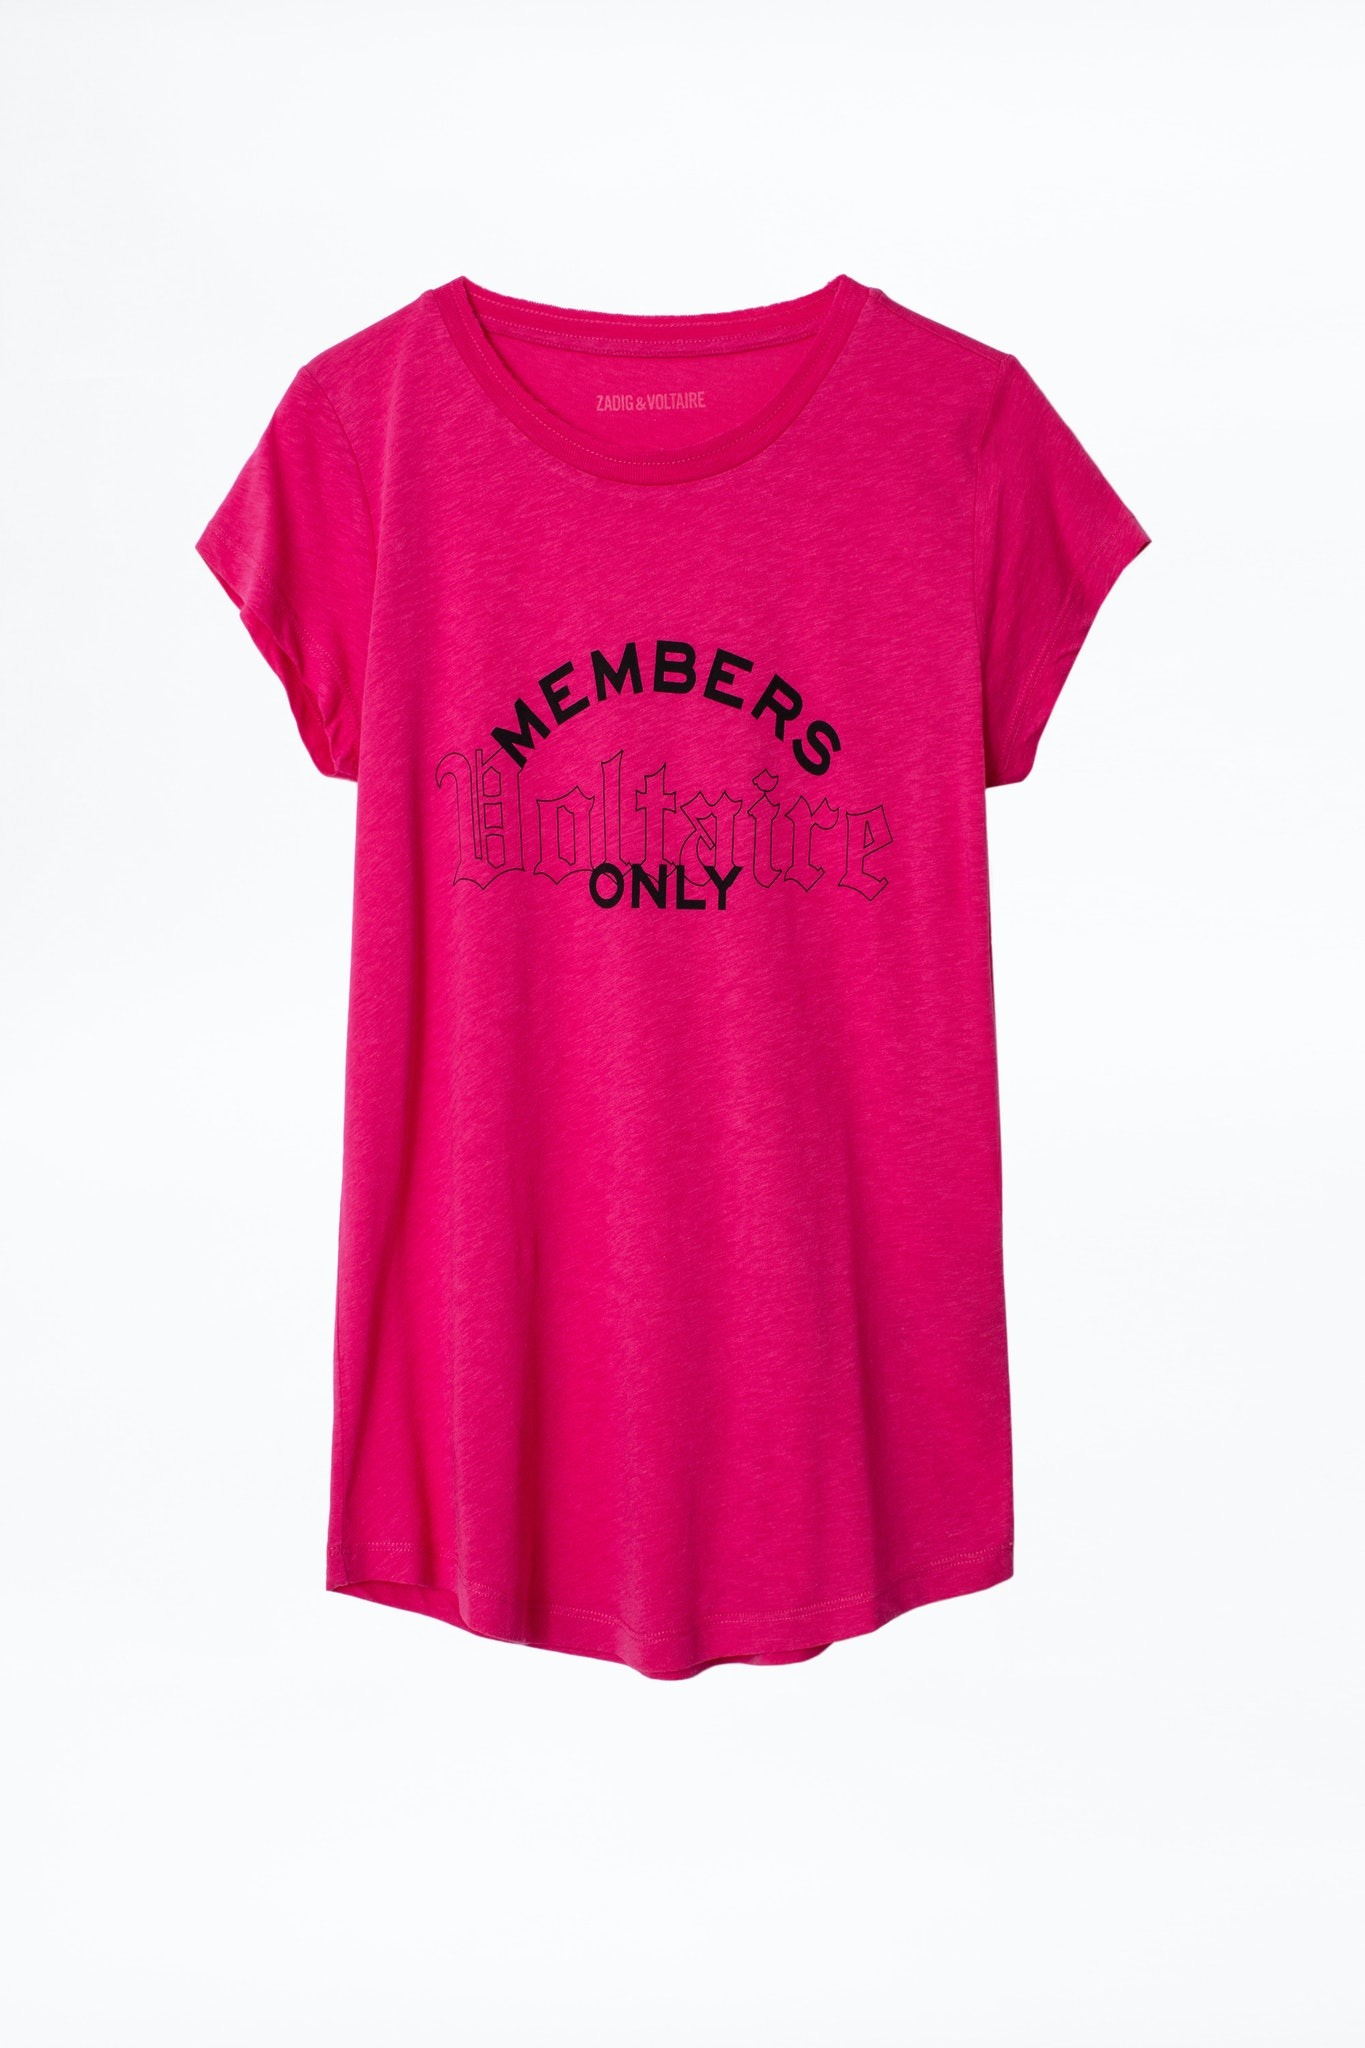 Members Only Skinny T-Shirt